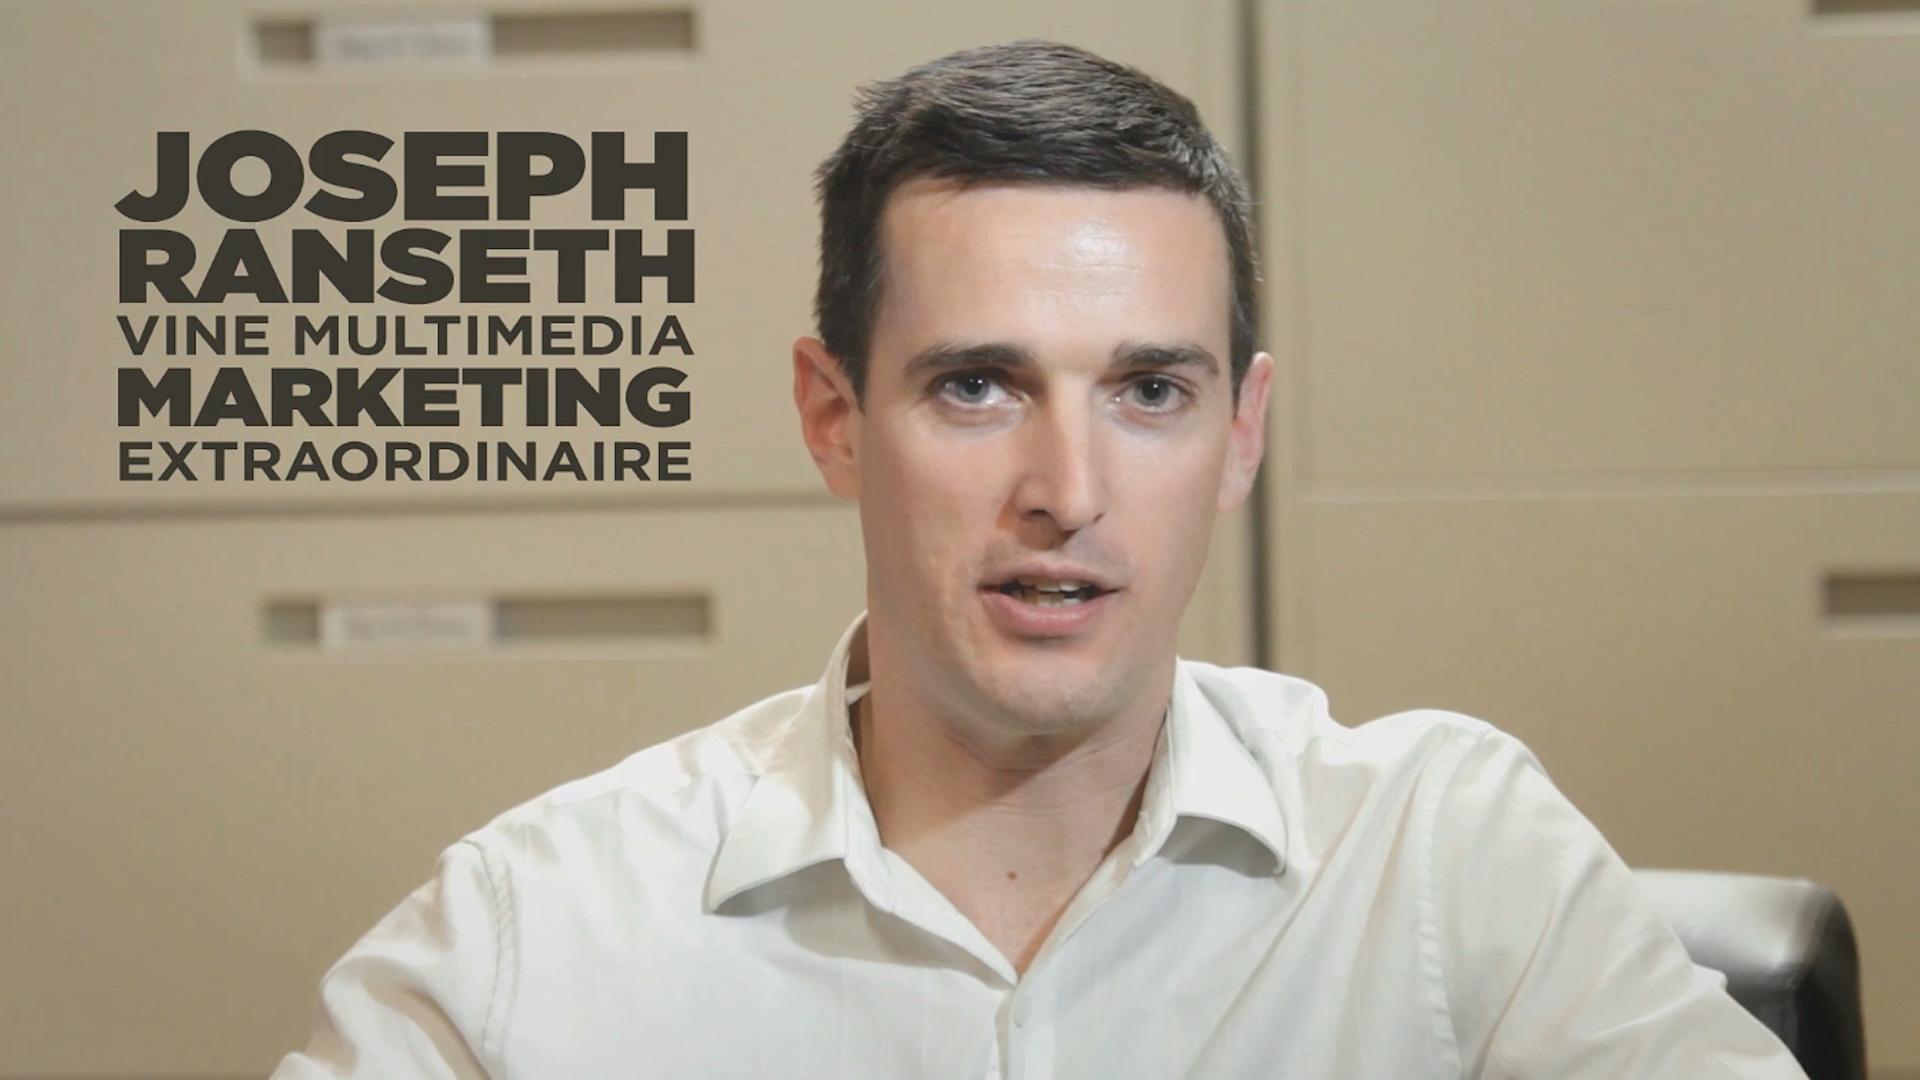 Joseph Ranseth- Marketing Extraordinaire